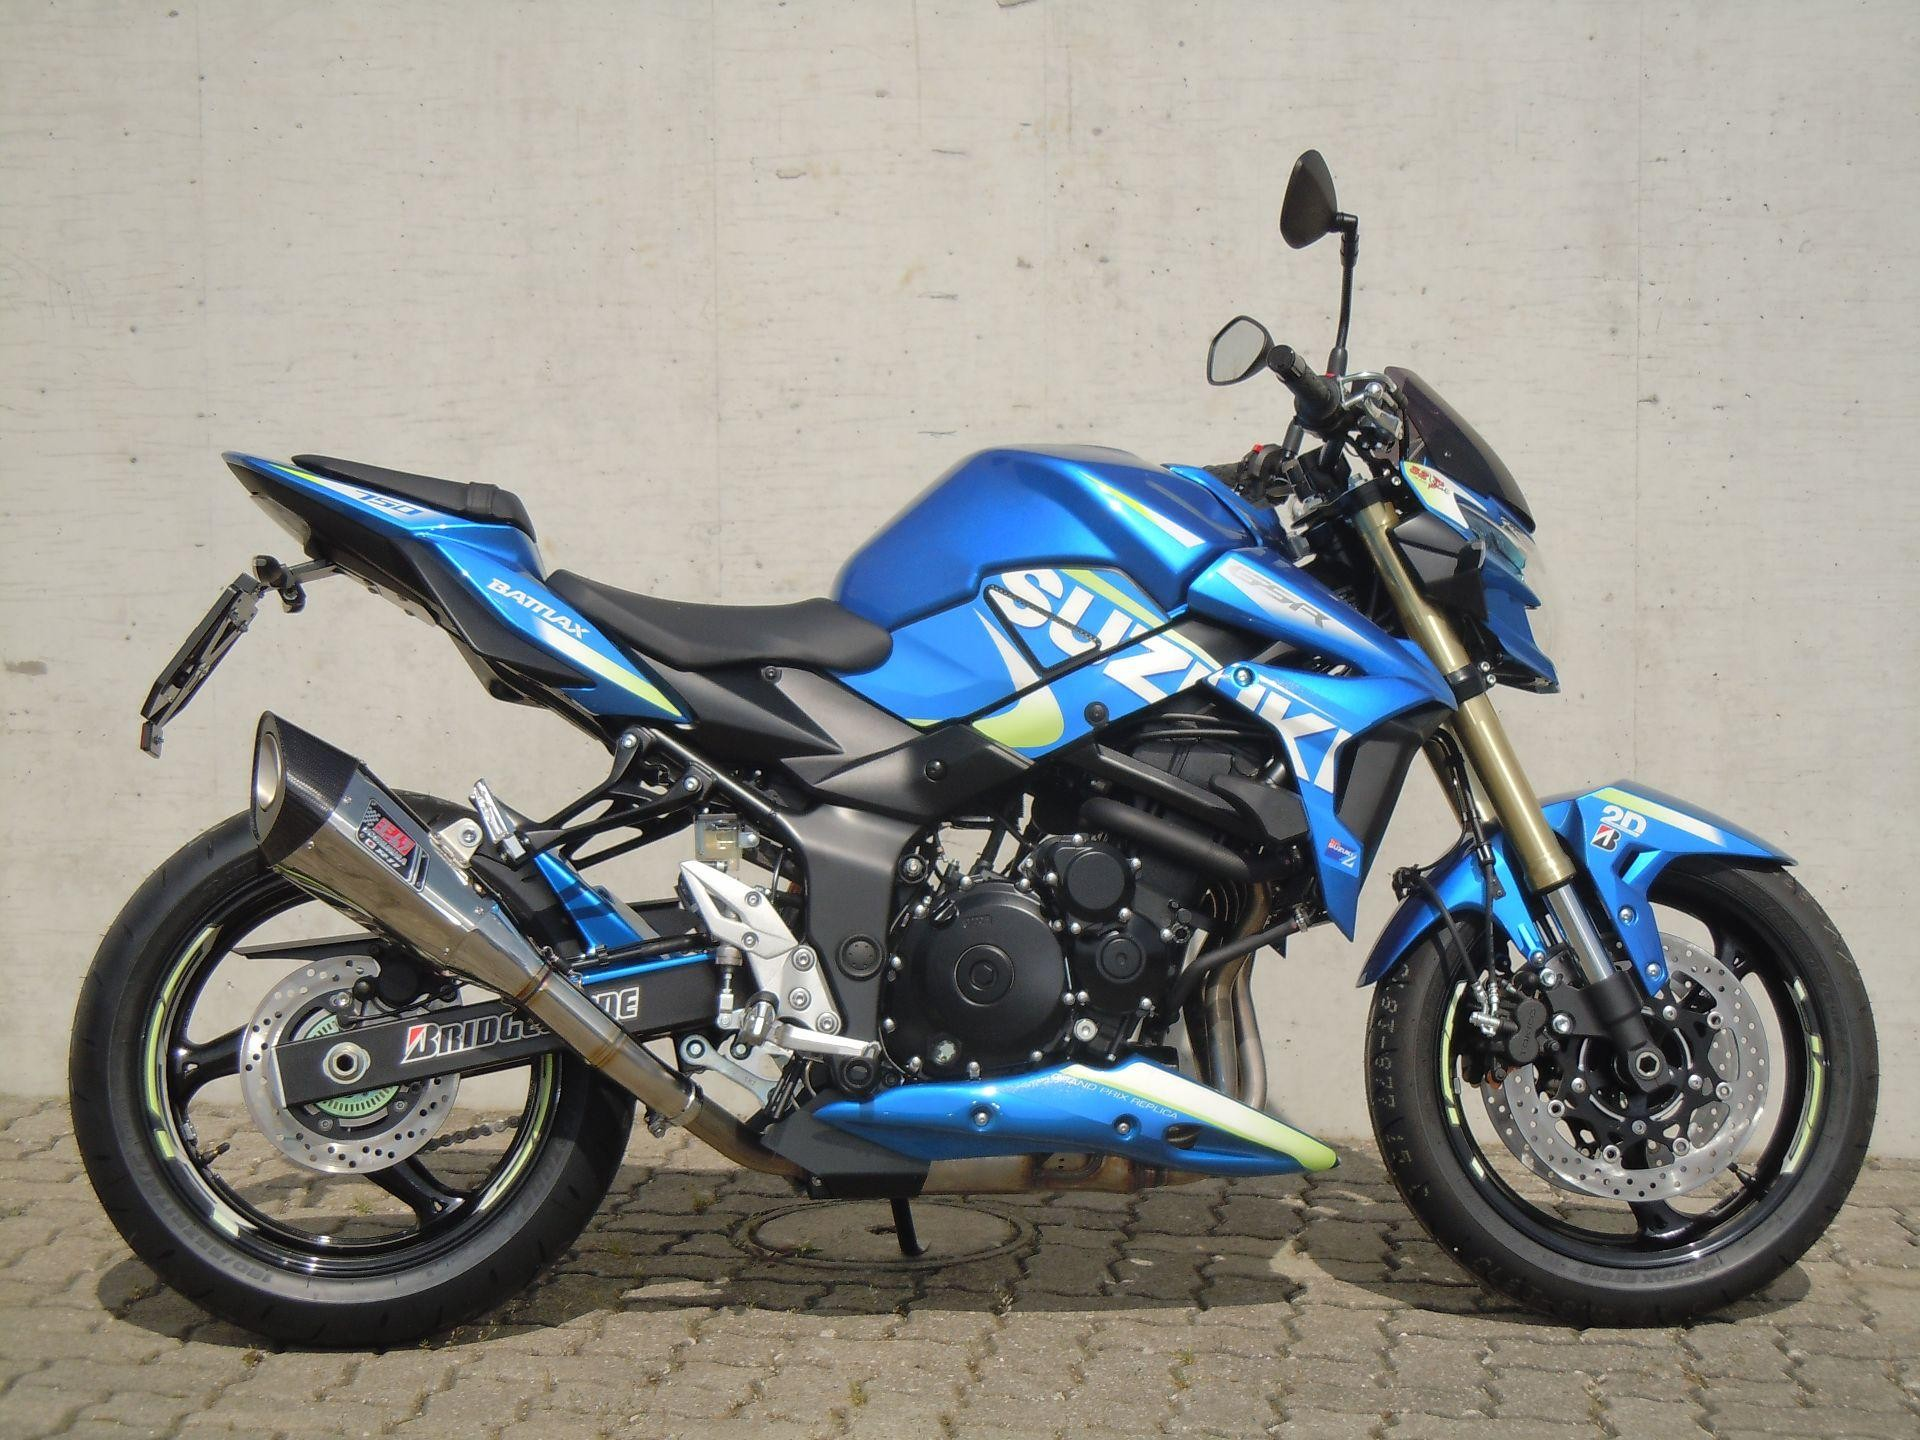 suzuki gsr 750 a moto gp edition rolf gall superbikes ag b tzberg neuve. Black Bedroom Furniture Sets. Home Design Ideas